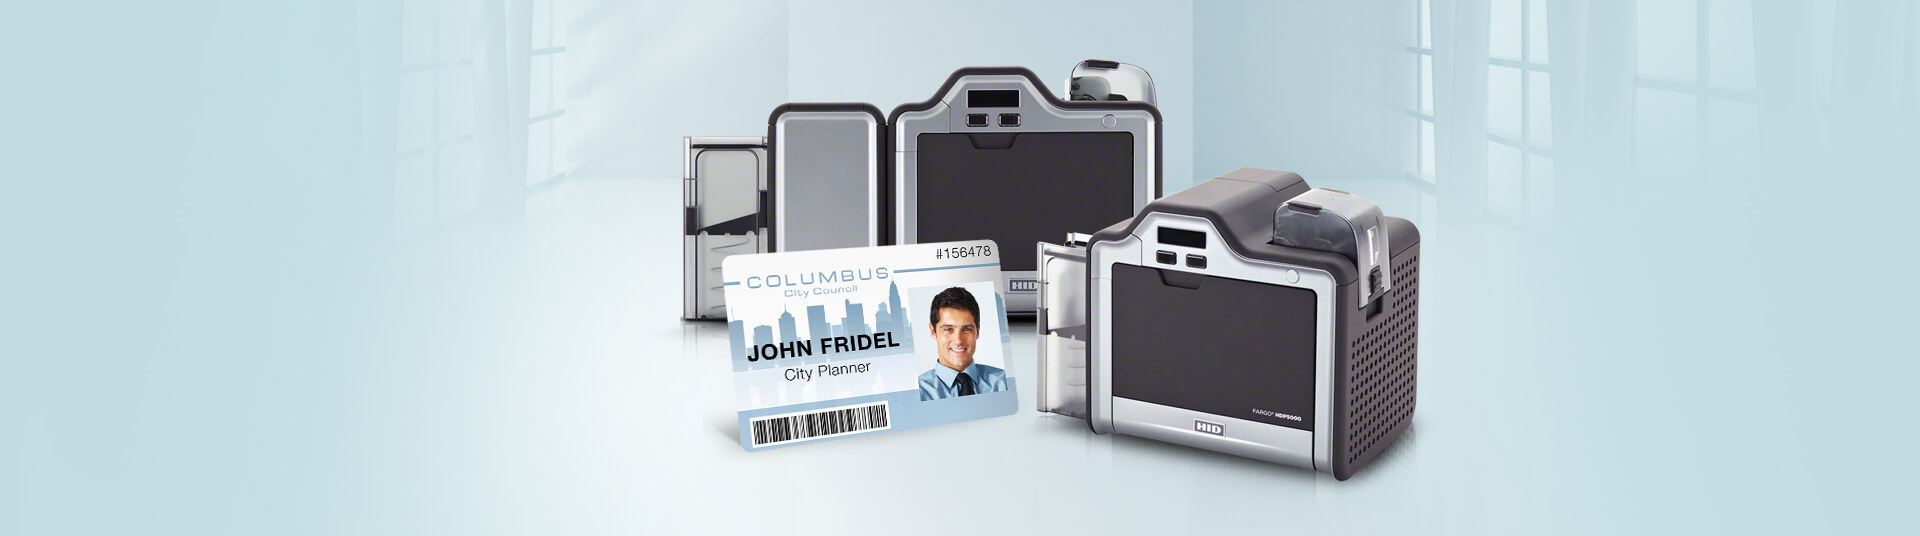 Fargo HDP5000 ID Card Printers